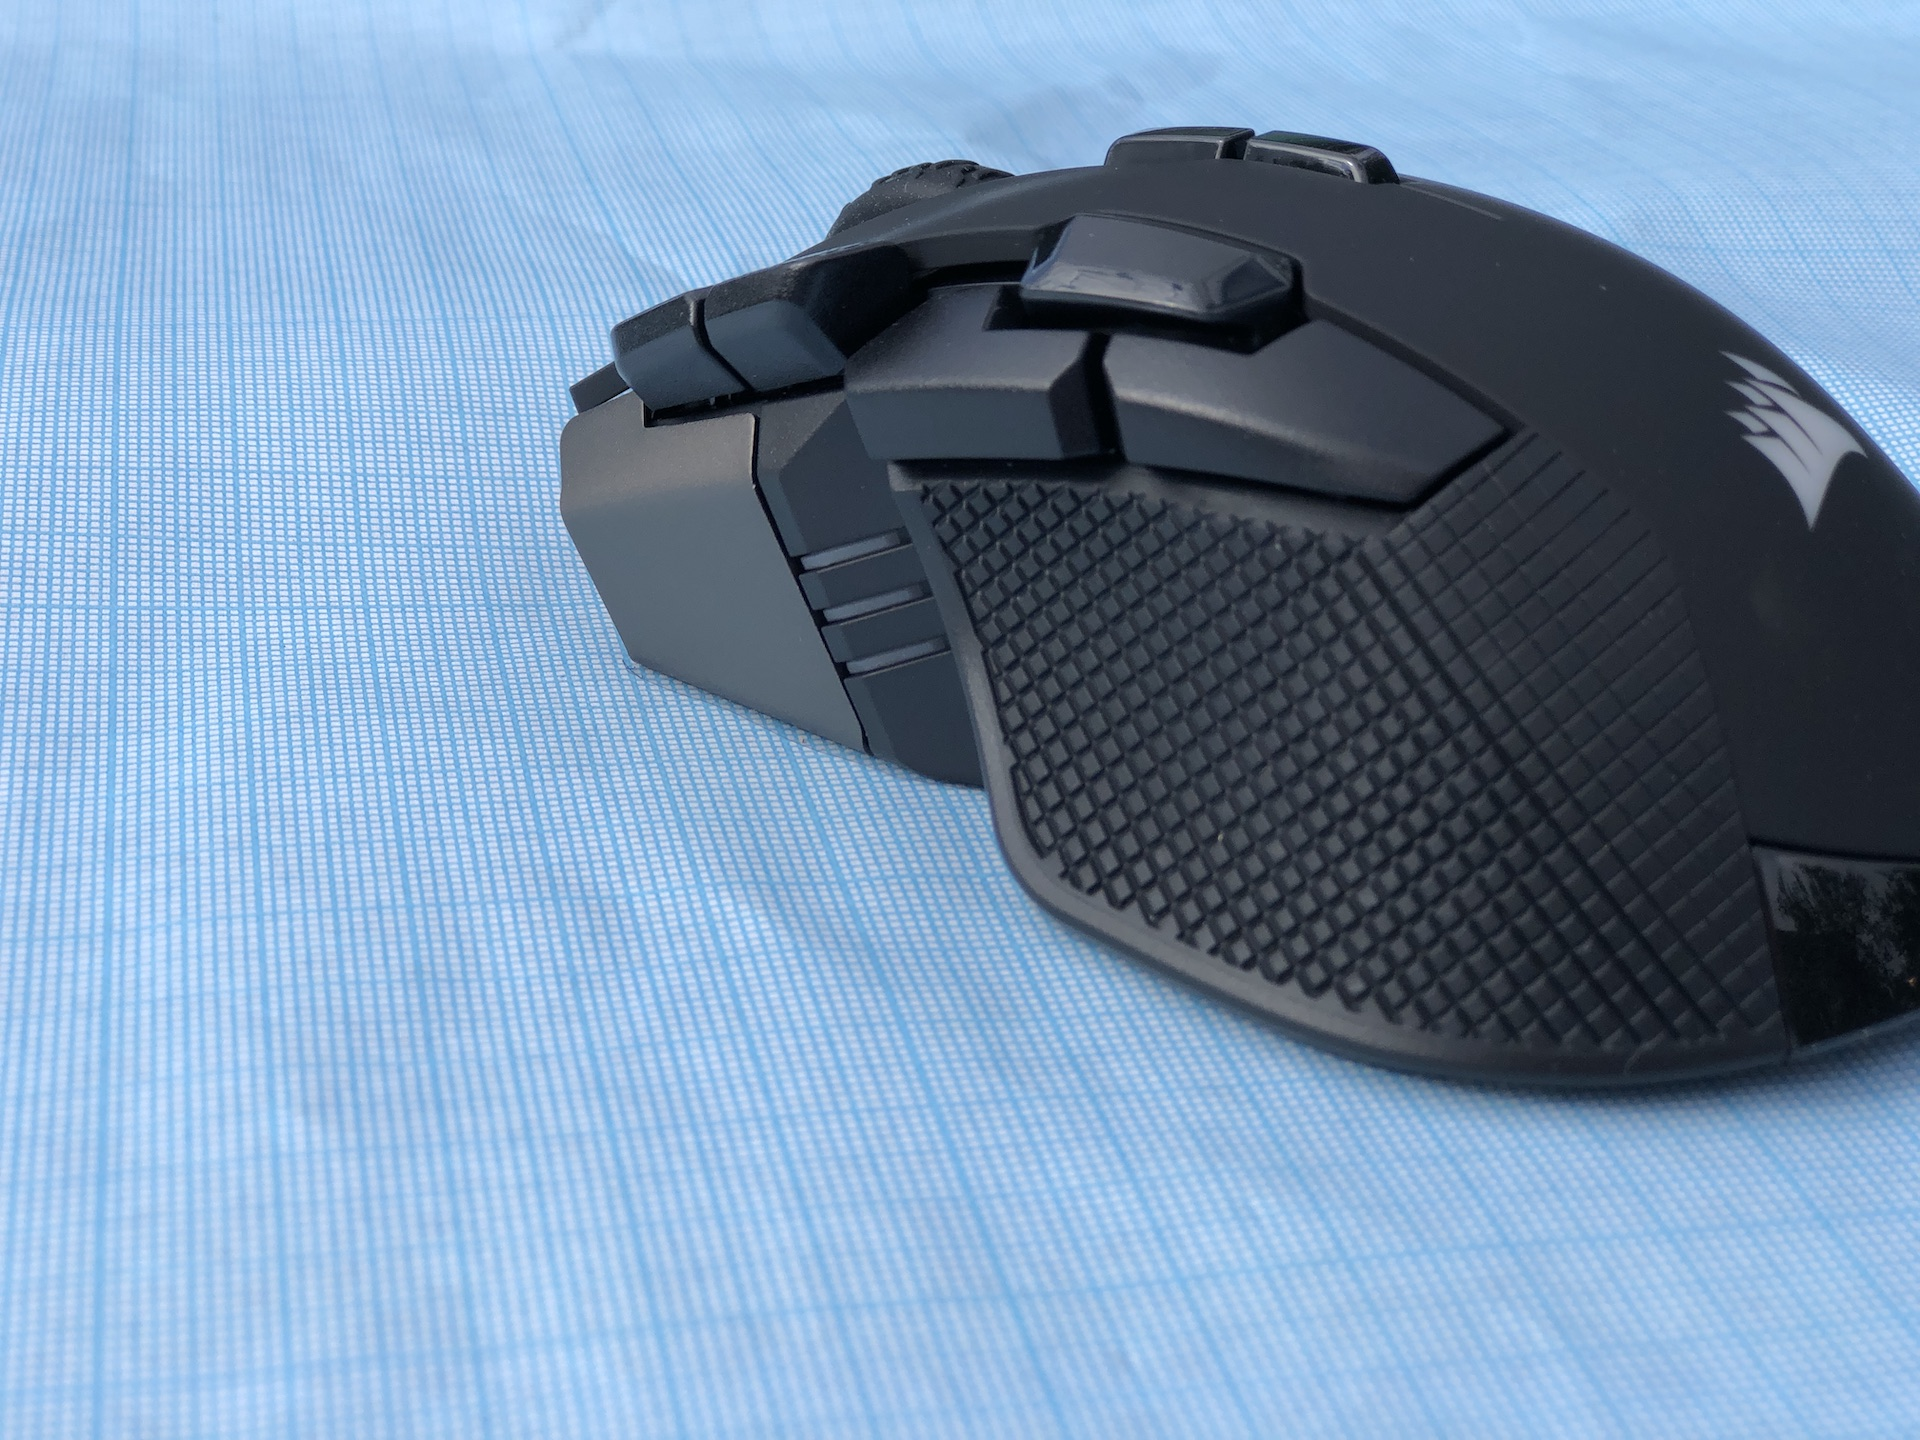 Обзор мыши Corsair Ironclaw RGB Wireless